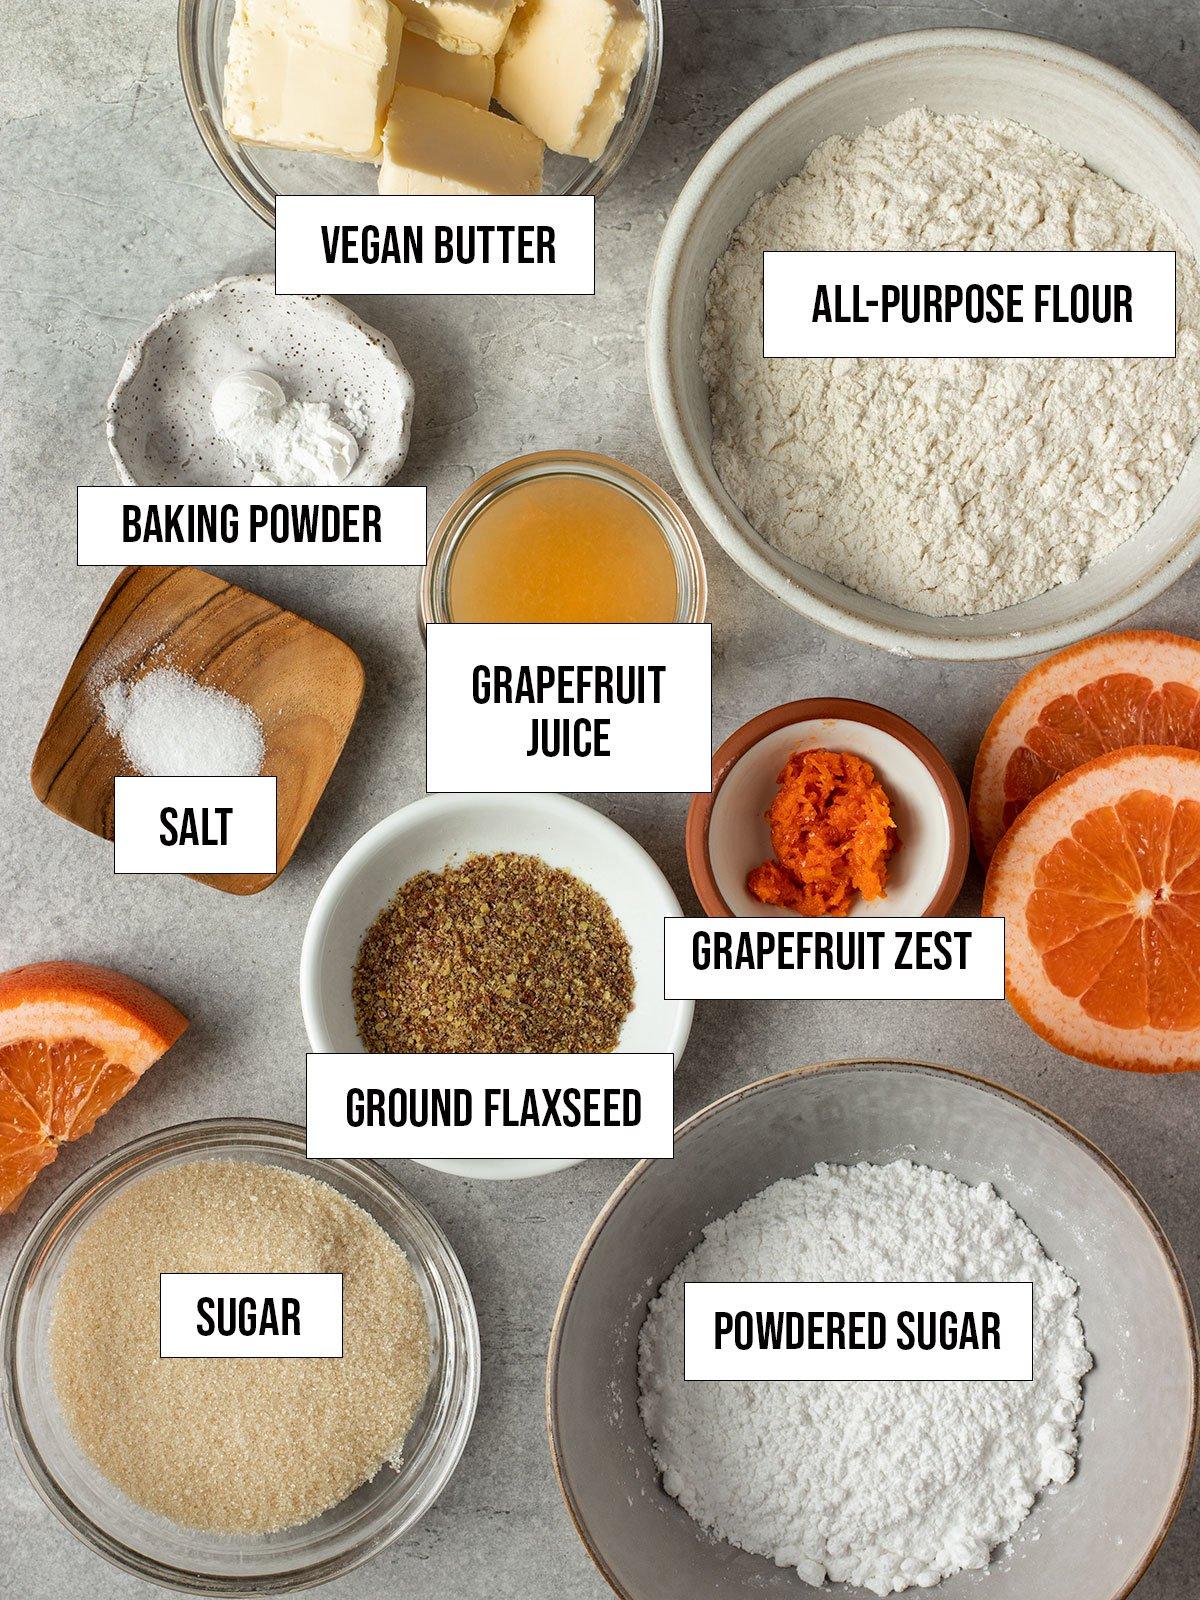 ingredients like flour, sugar, grapefruit juice, grapefruit zest, salt, baking powder, vegan butter, flaxseed, and powdered sugar